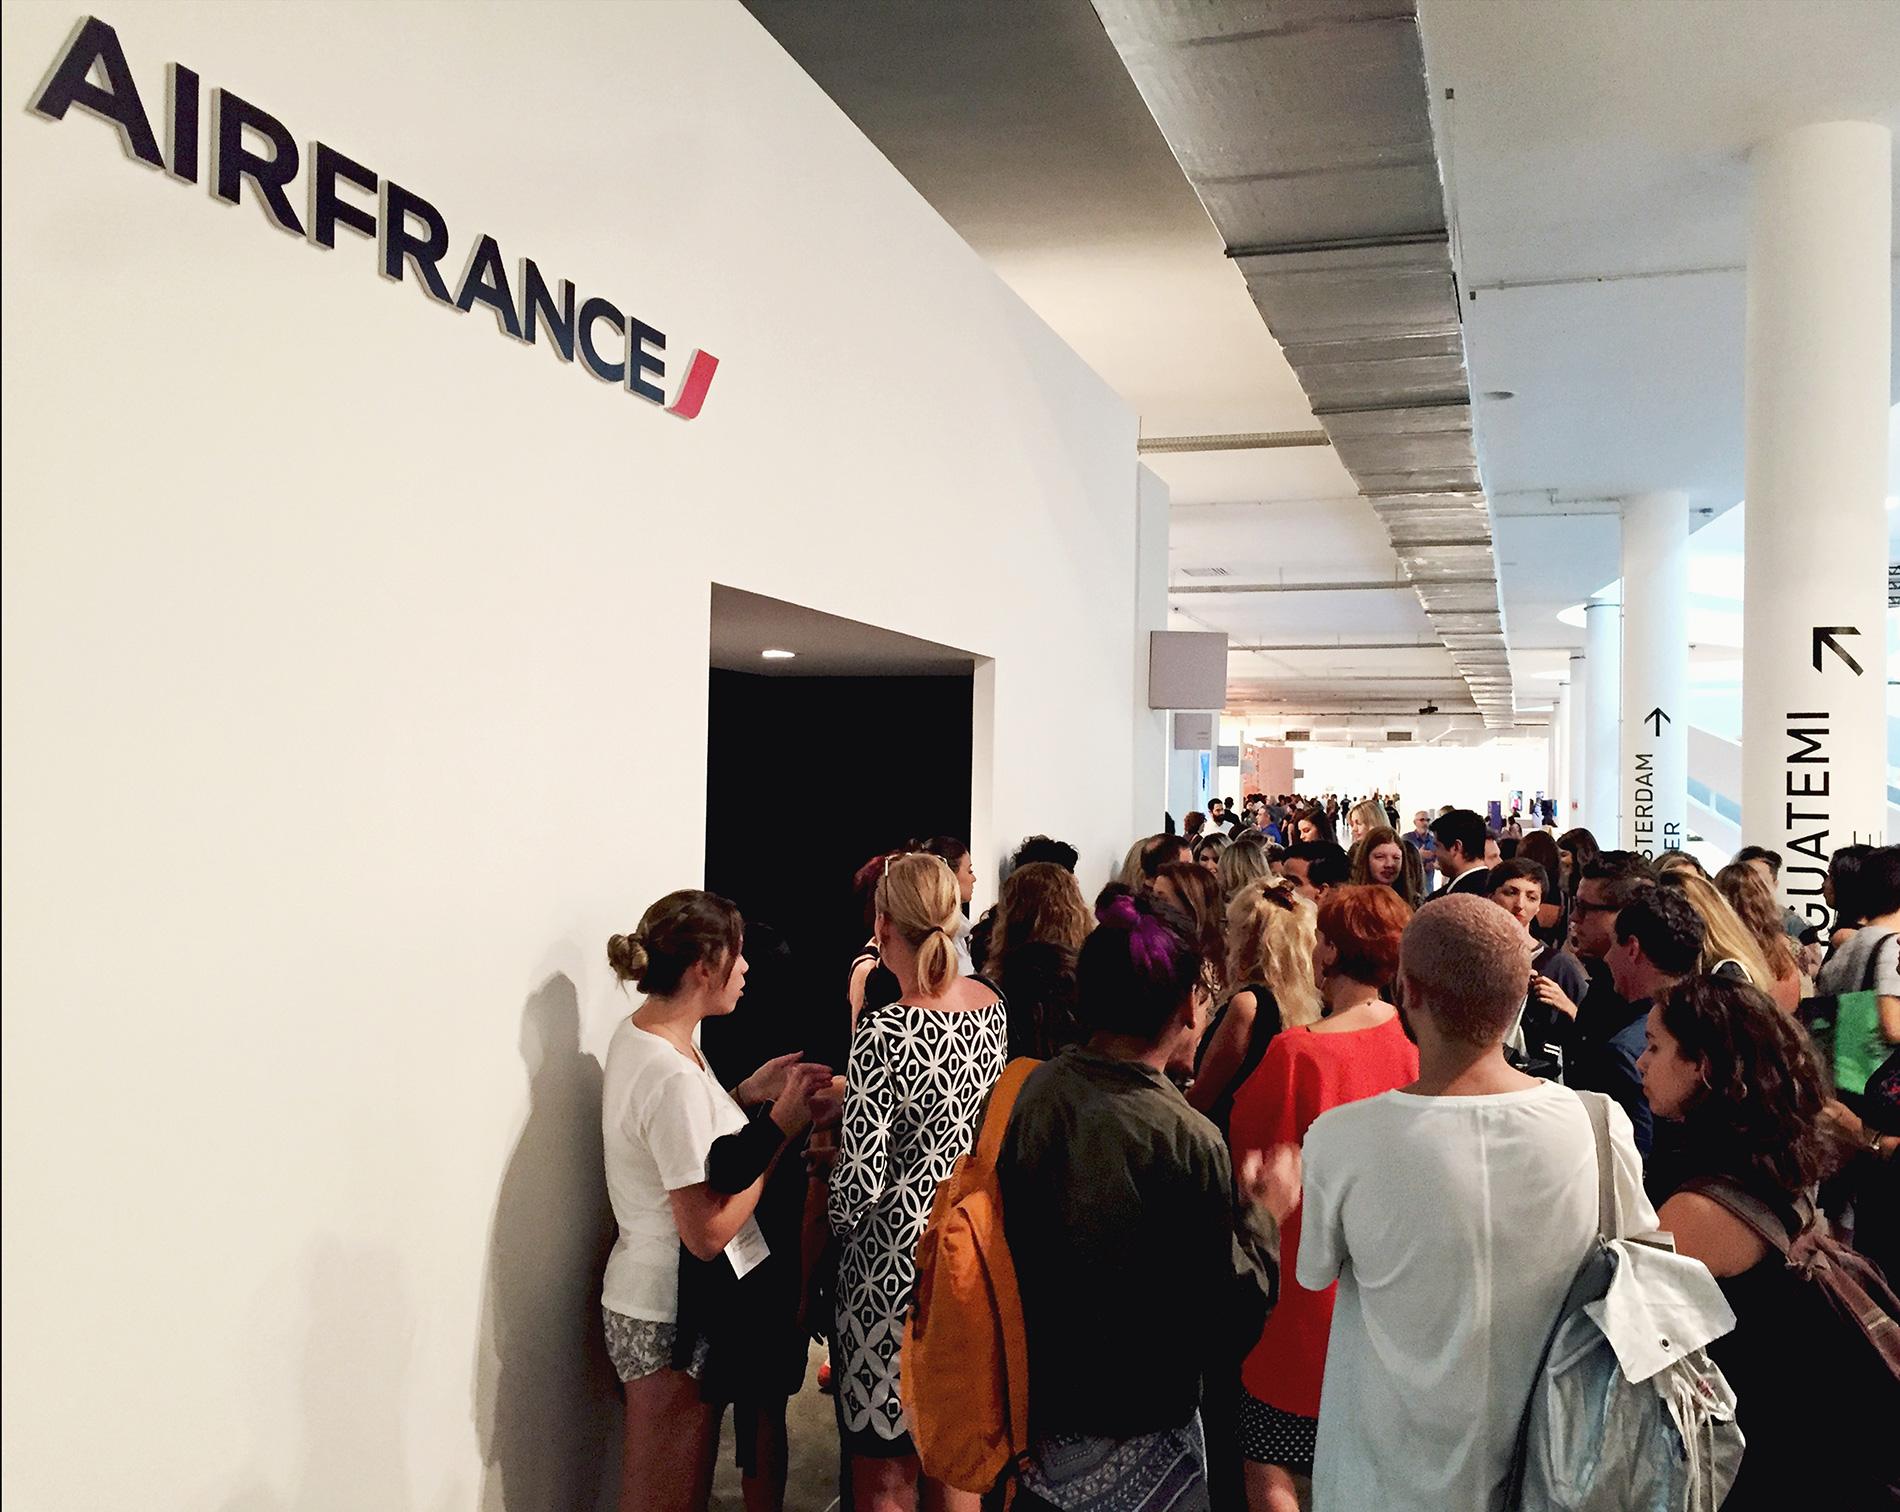 airfrance6.jpg